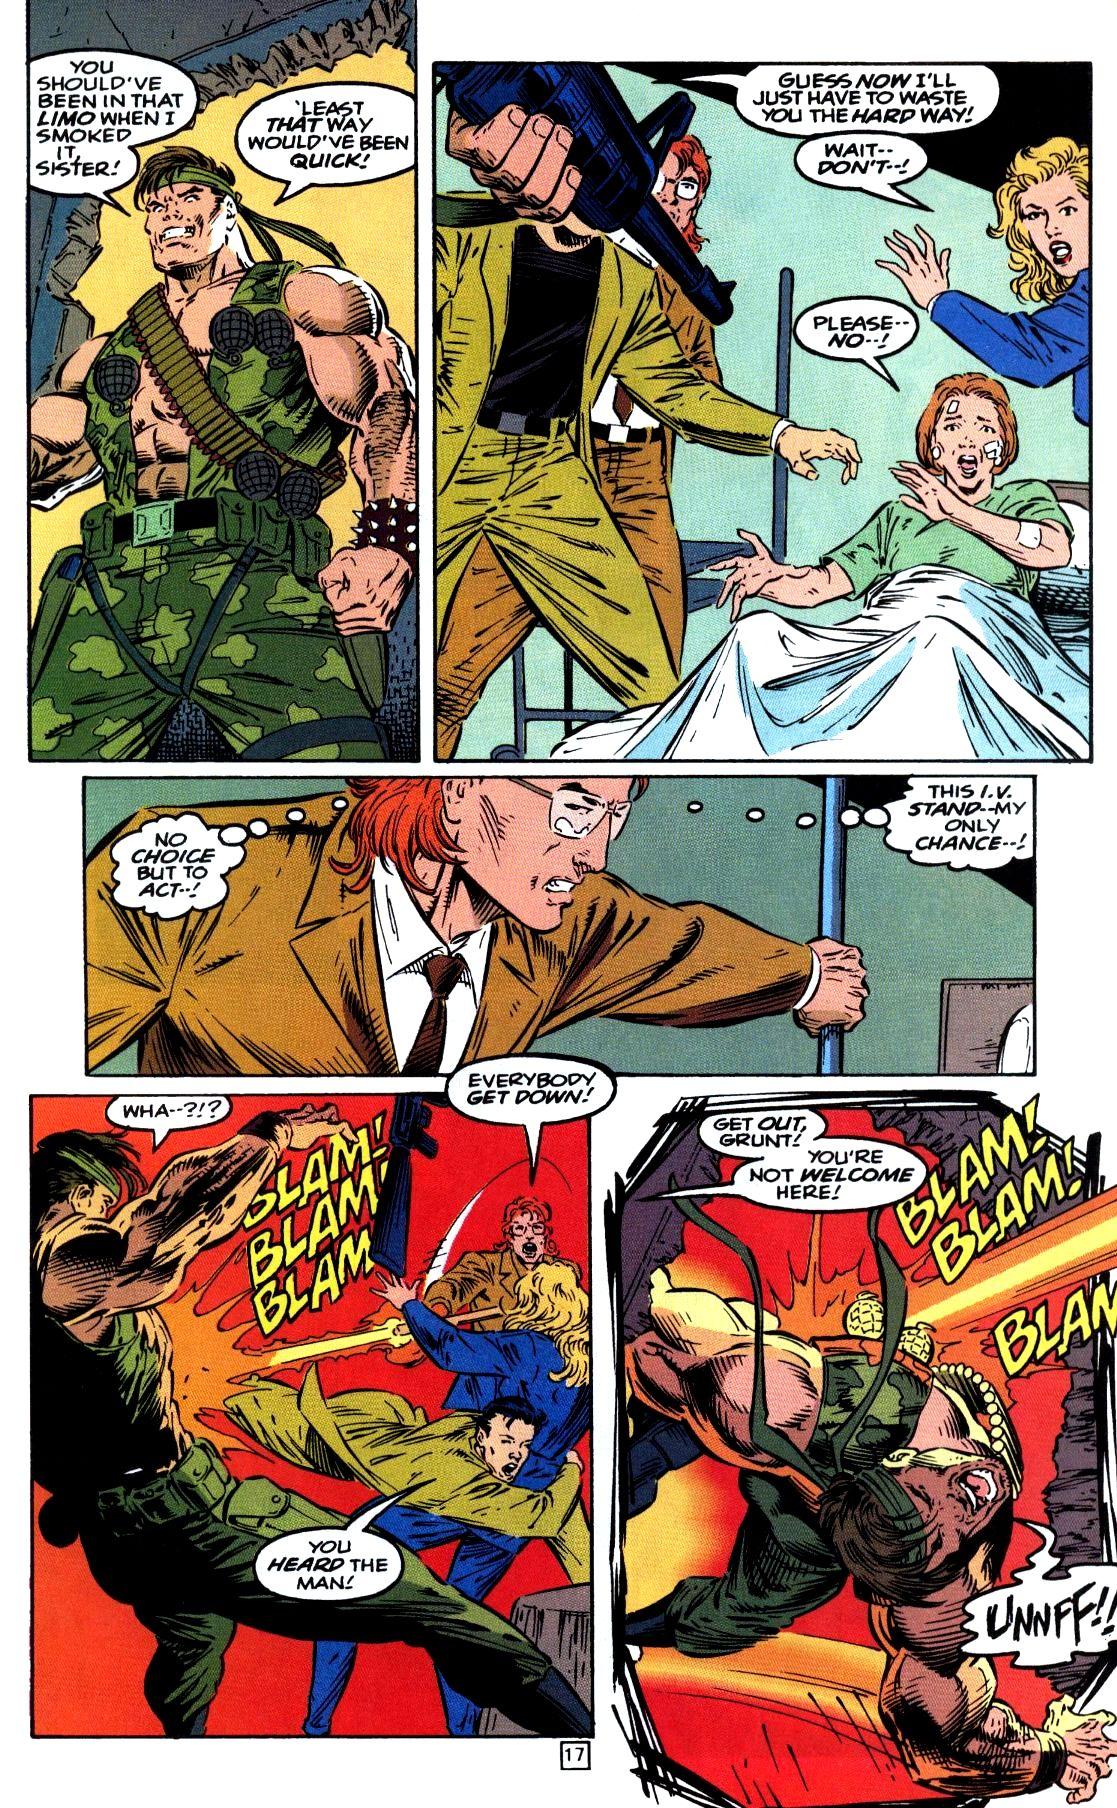 Read online Gunfire comic -  Issue #7 - 21